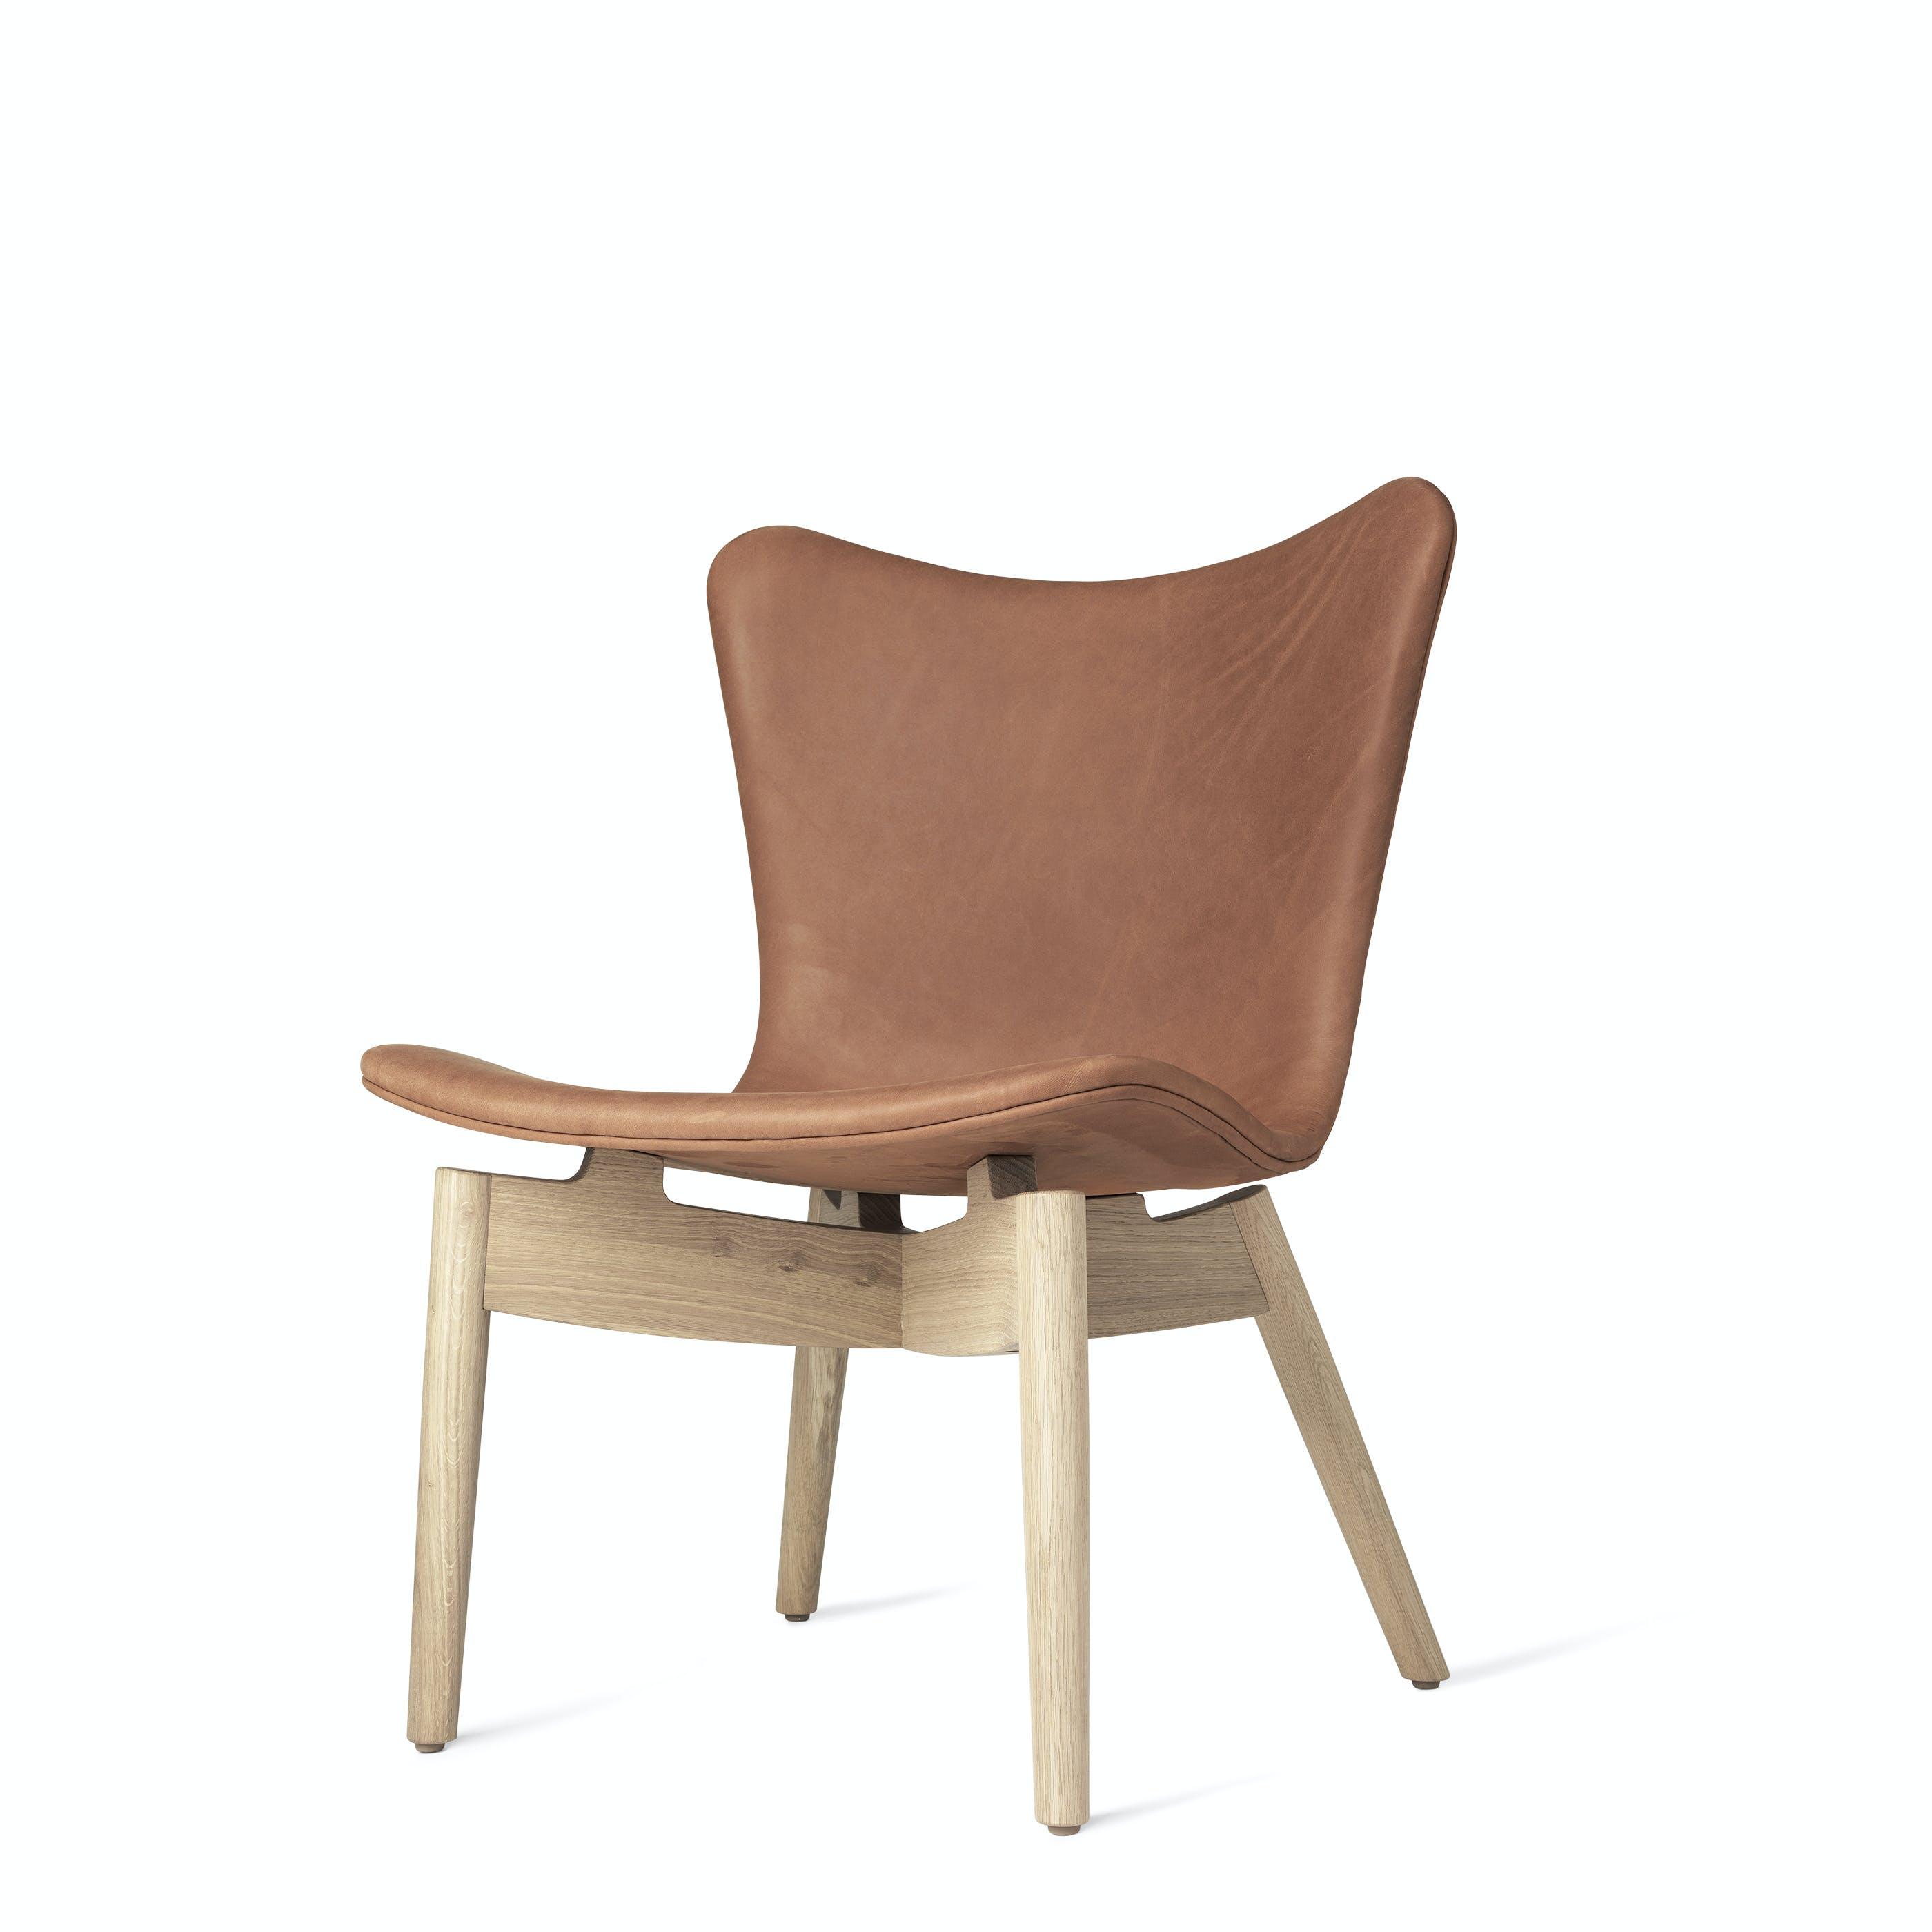 Mater Rust Shell Lounge Chair Oak Legs Haute Living